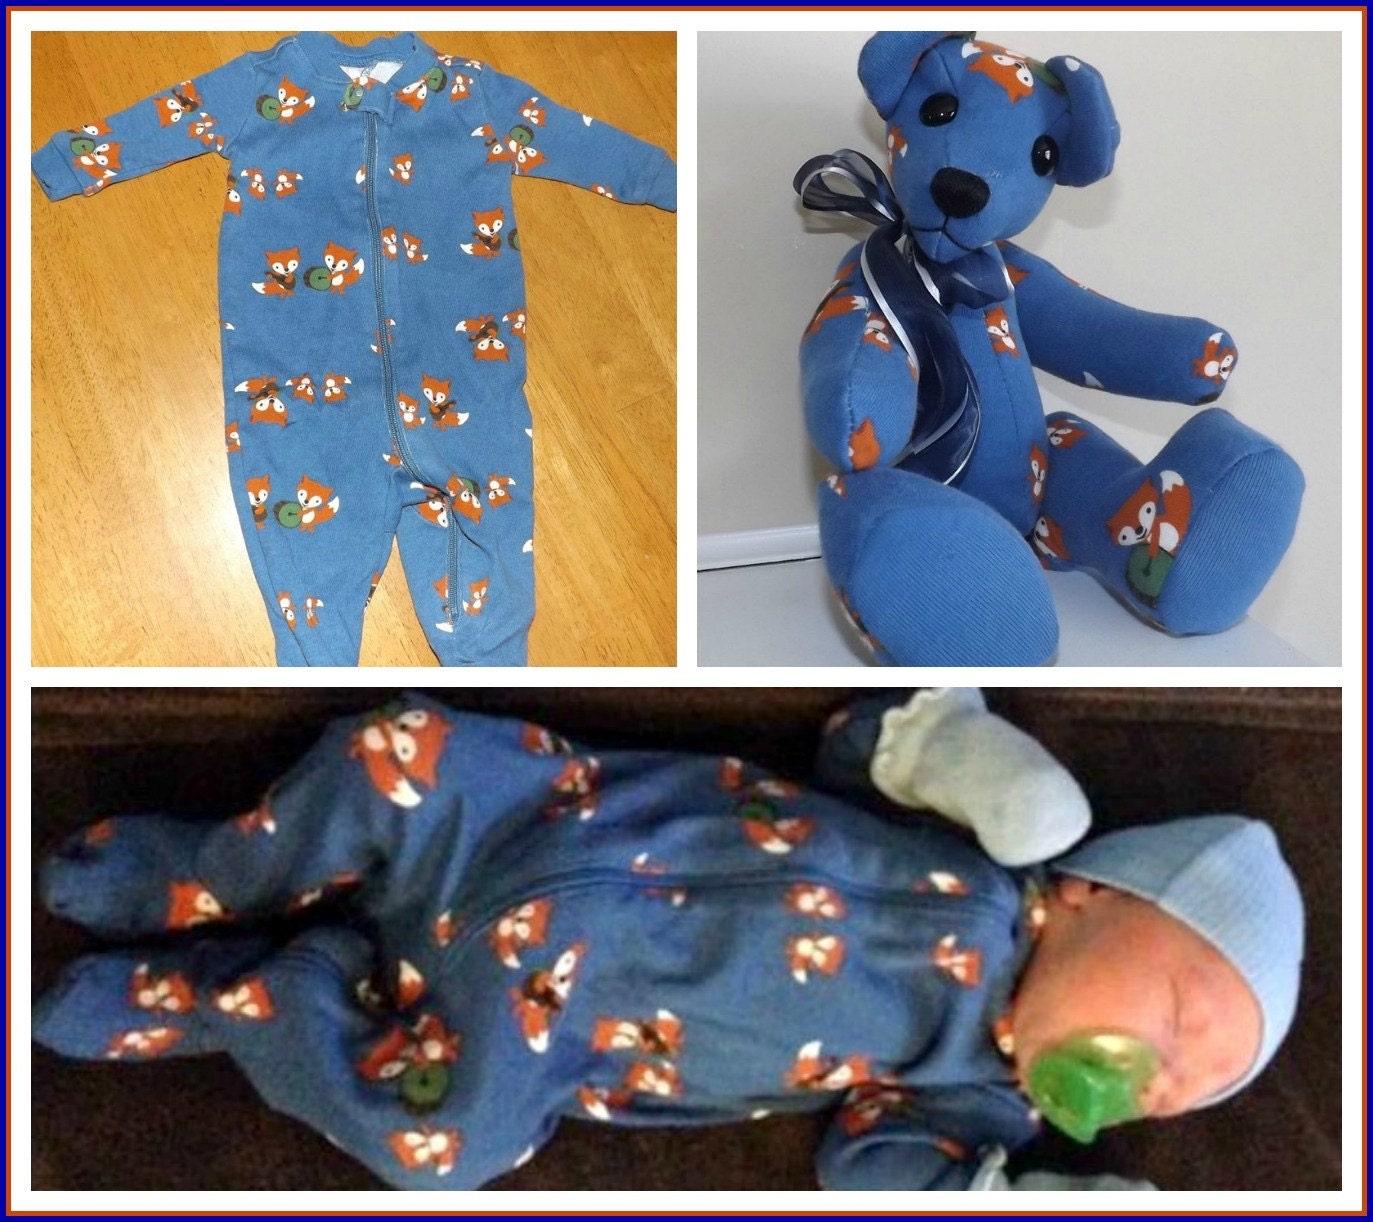 Memory teddy bears custom made from baby by SeeMoreBears